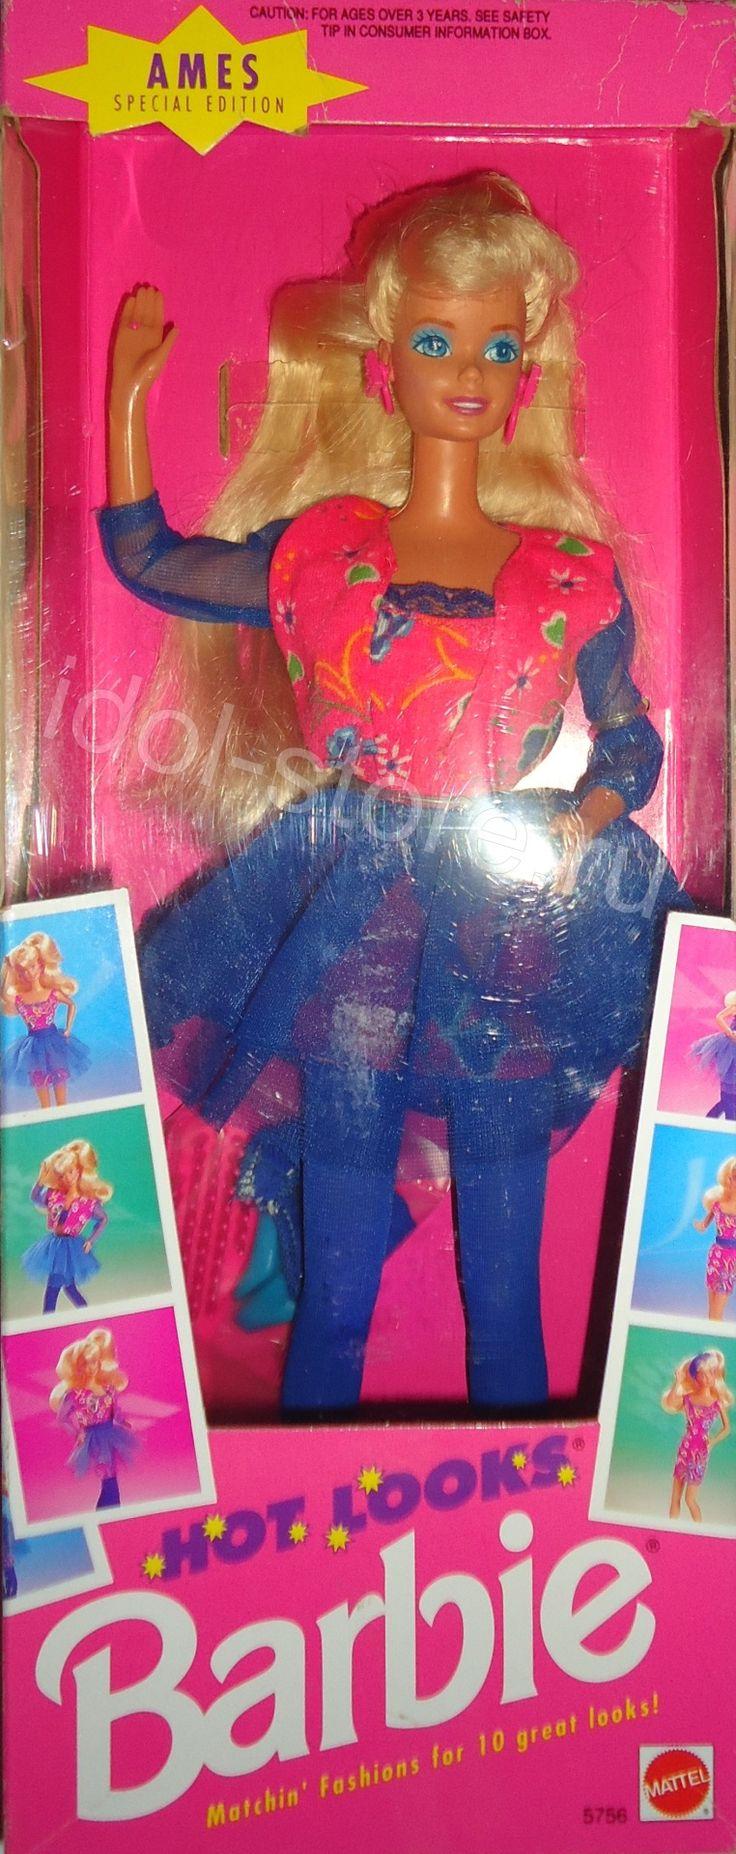 "Hot Looks - Blonde Barbie Doll - Special Edition - AMES 1992. Кукла Барби винтажная ""Хот Лукс"" - специальный выпуск 1992 года"